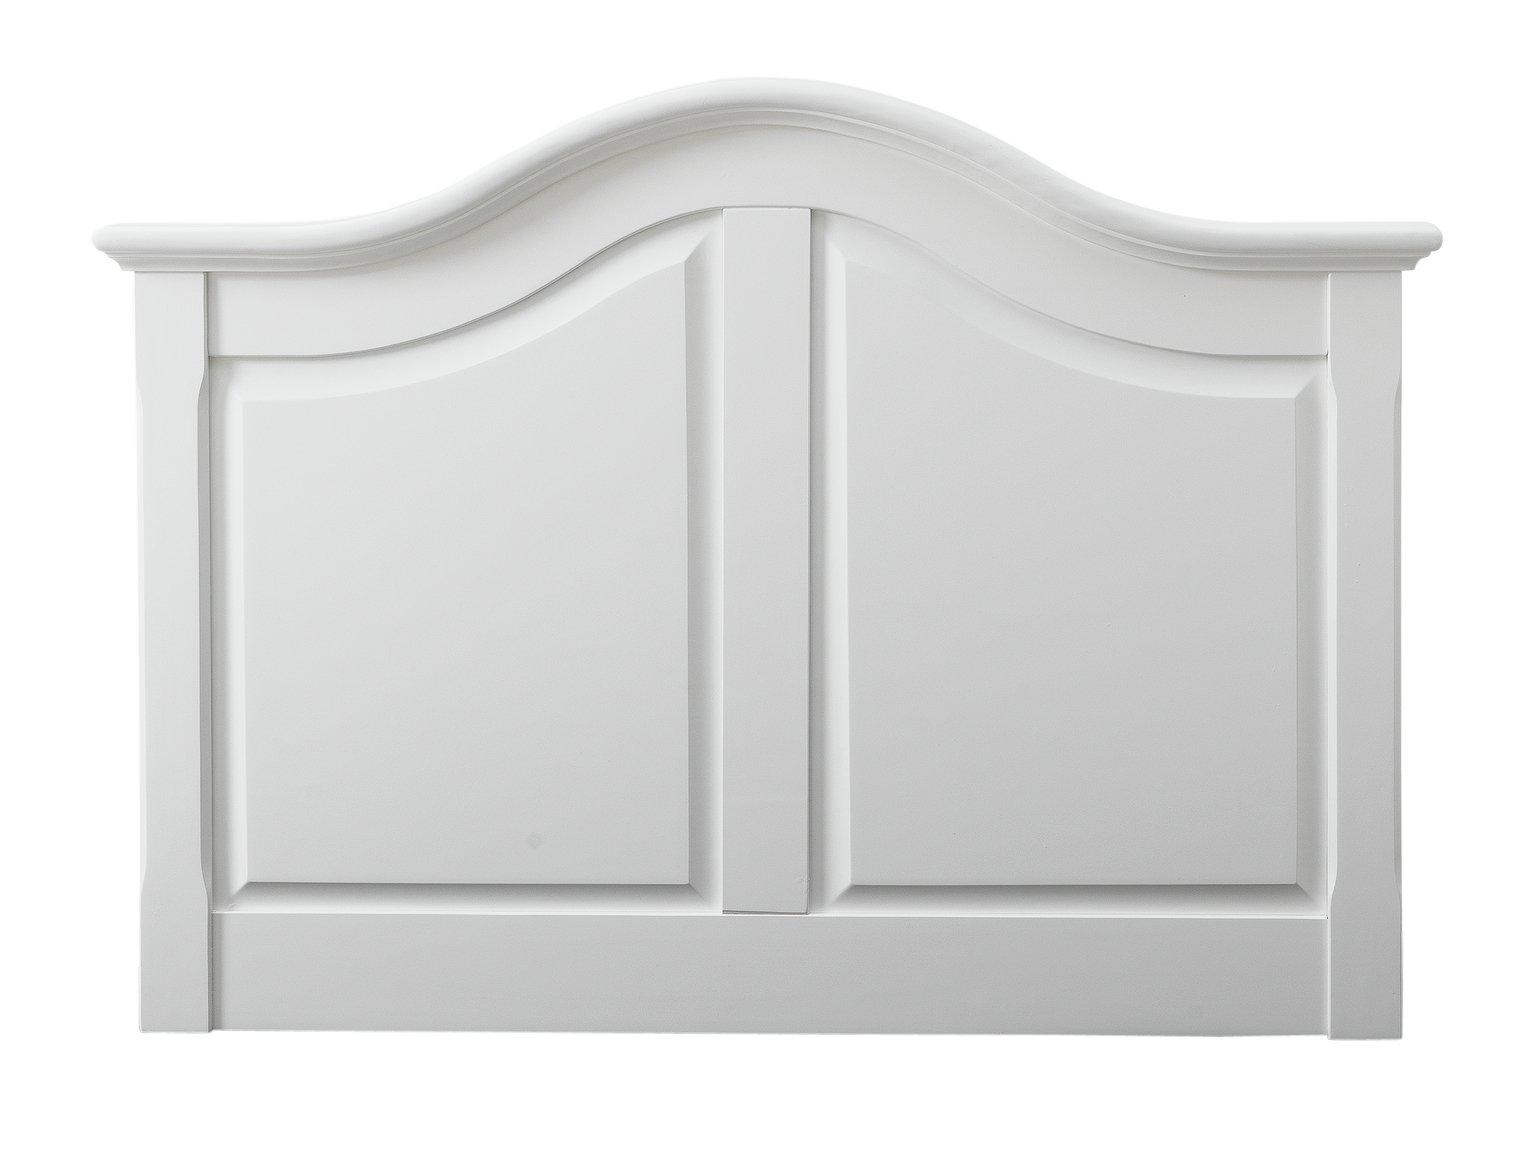 Argos Home Avignon Single Headboard - White